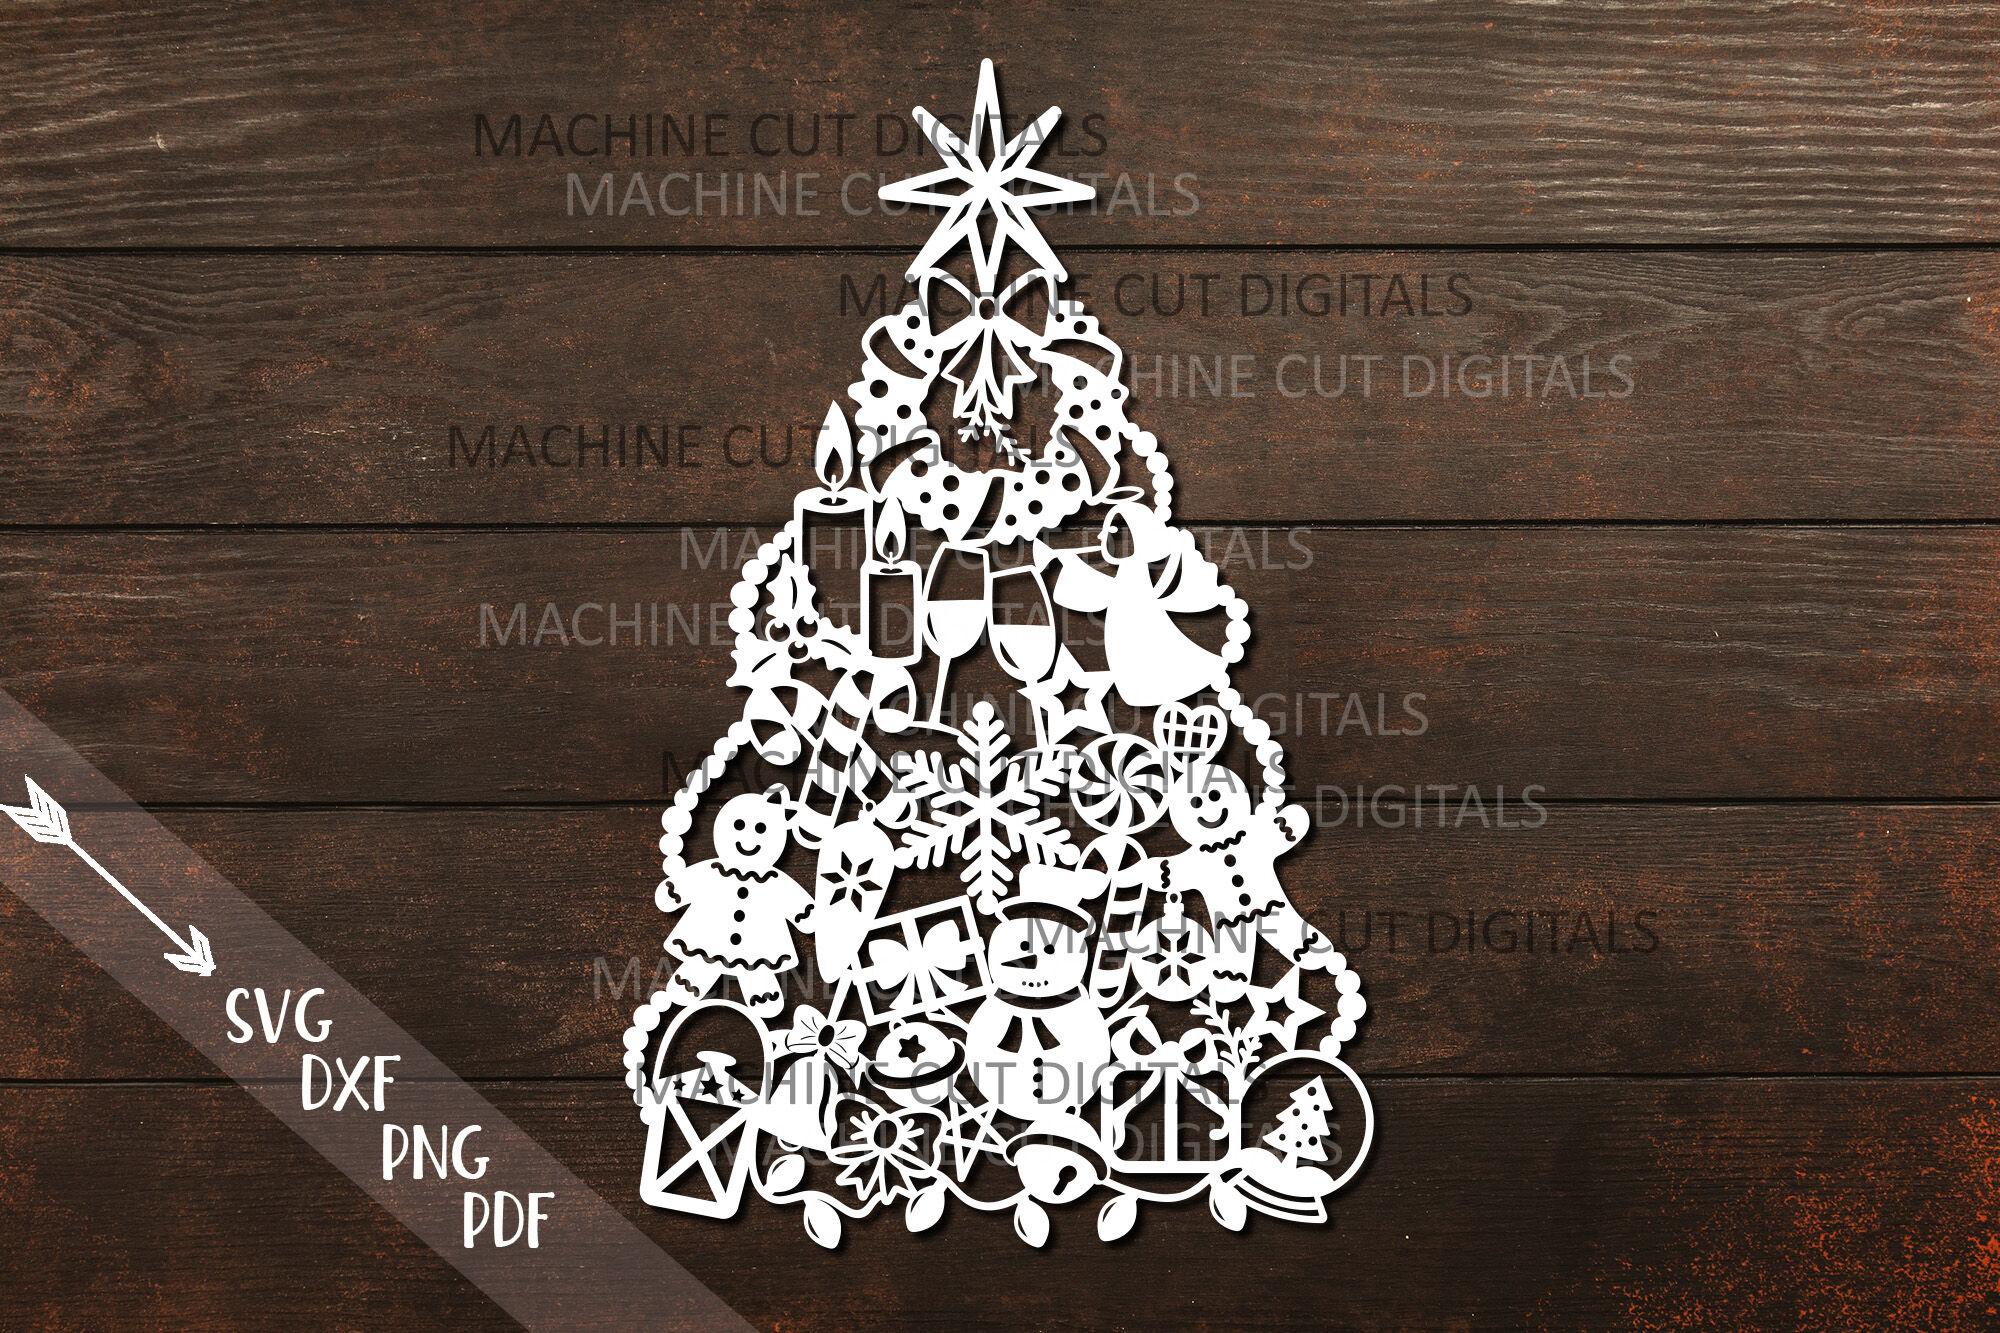 Assorted Christmas Tree Decoration Svg Laser Cut Papercut Template By Kartcreation Thehungryjpeg Com